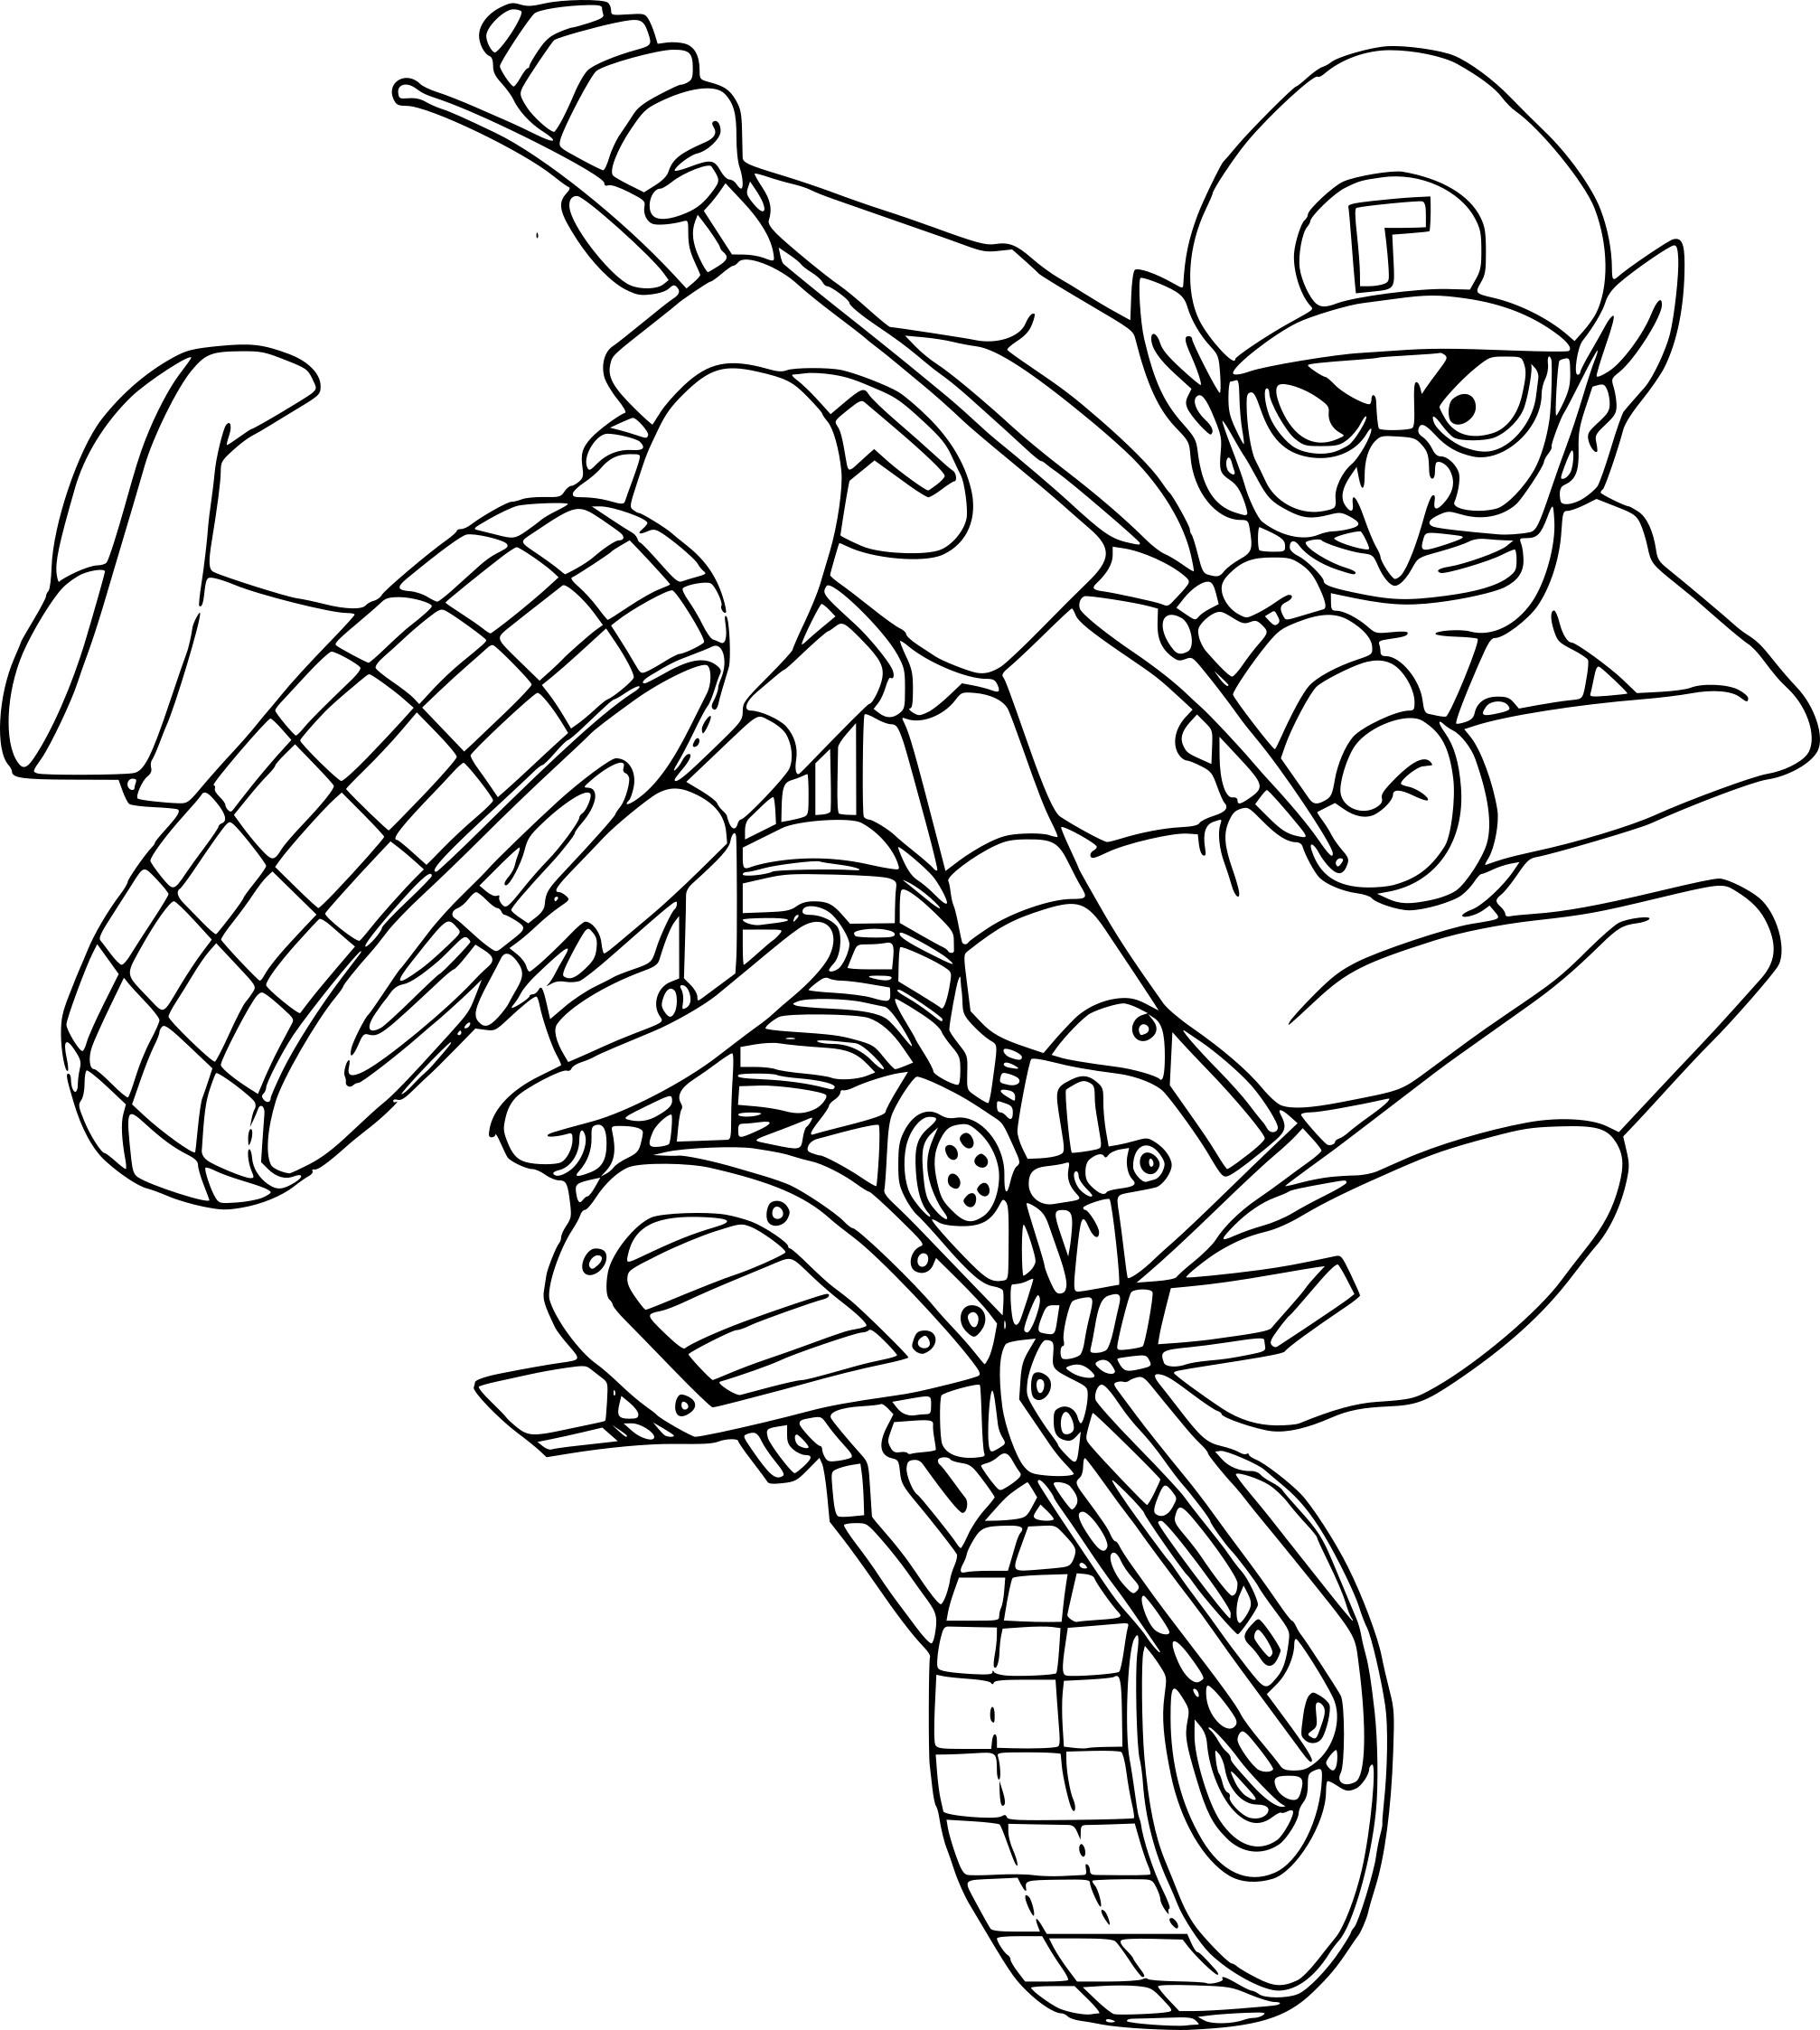 Coloriage Waluigi.Coloriage Waluigi Mario Kart A Imprimer